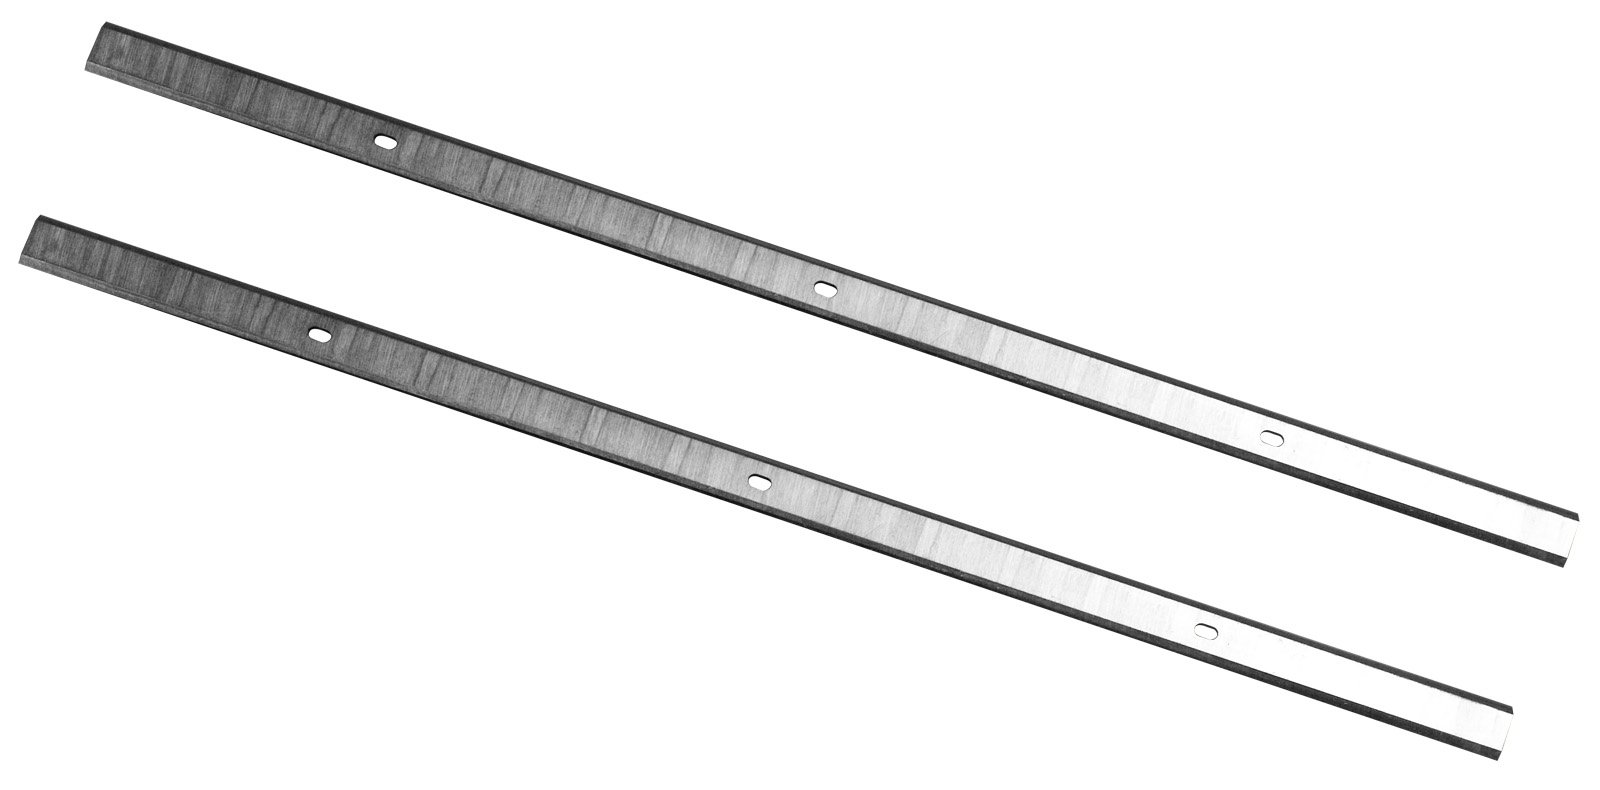 POWERTEC 128020 13-Inch HSS Planer Knives for Delta 22-580, Set of 2